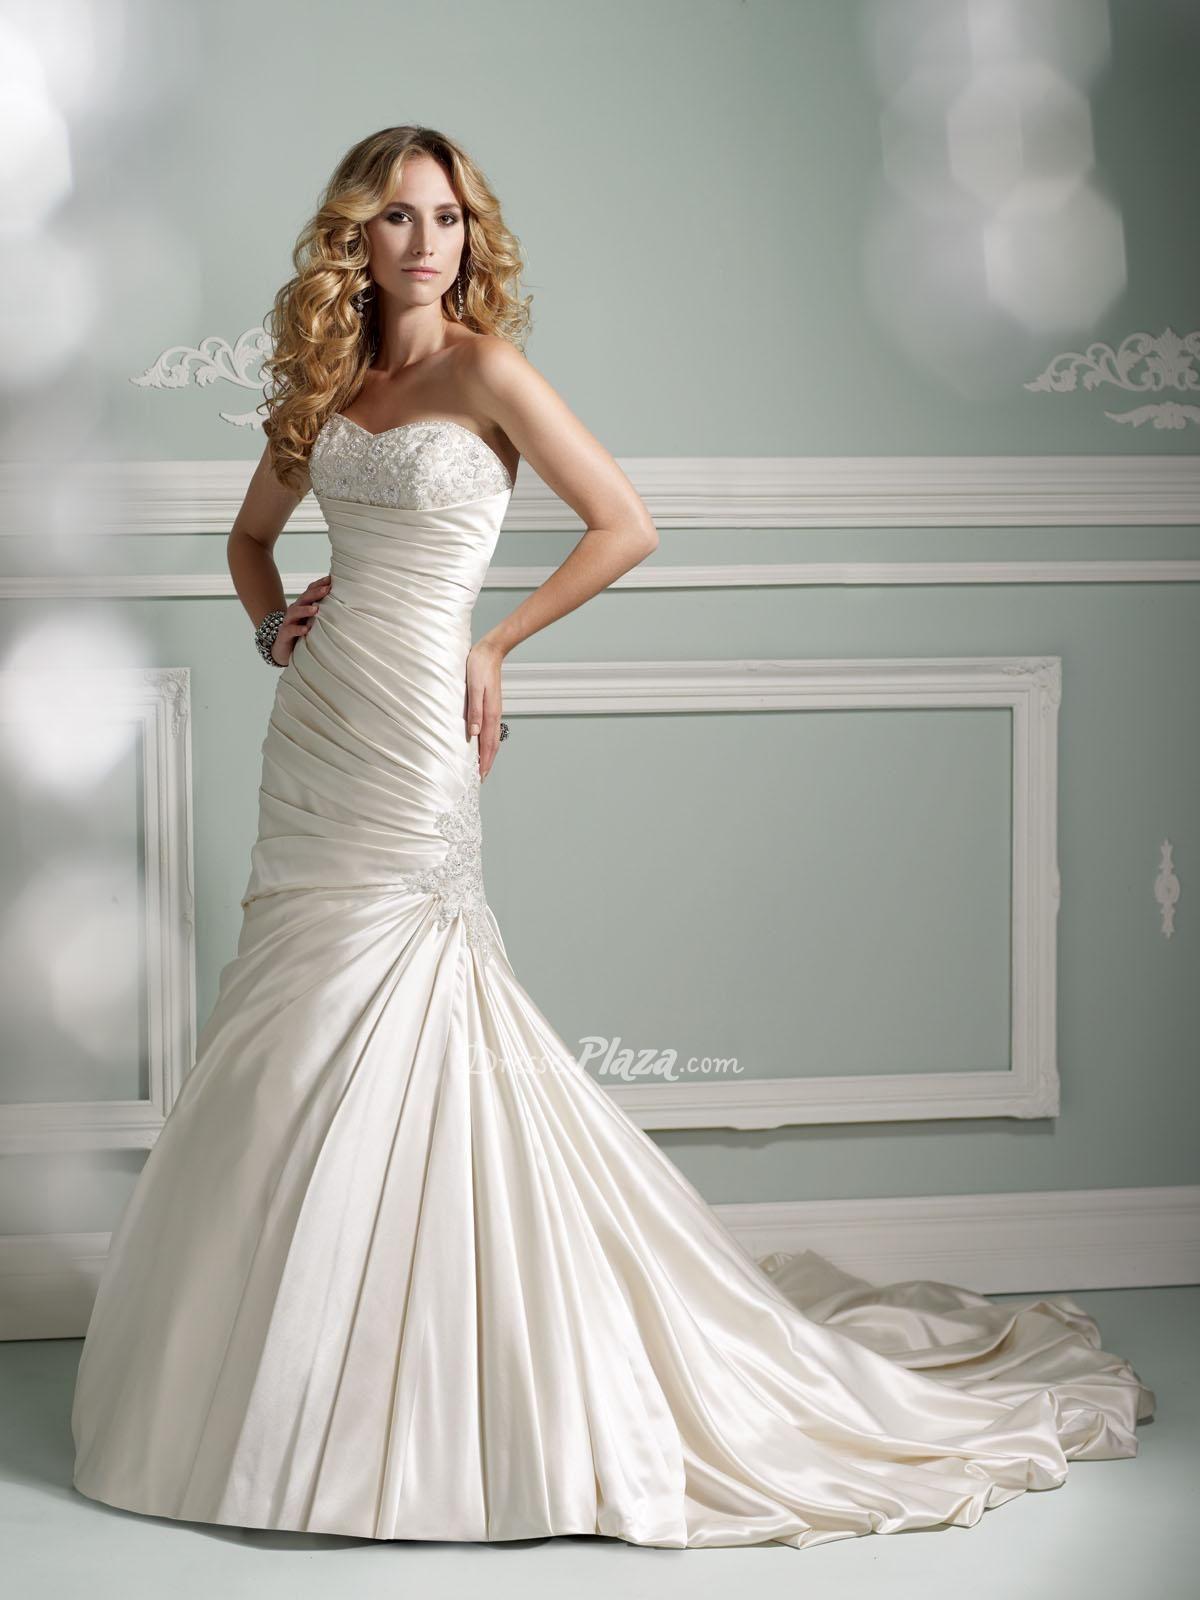 Strapless mermaid wedding dress from satin marry me pinterest